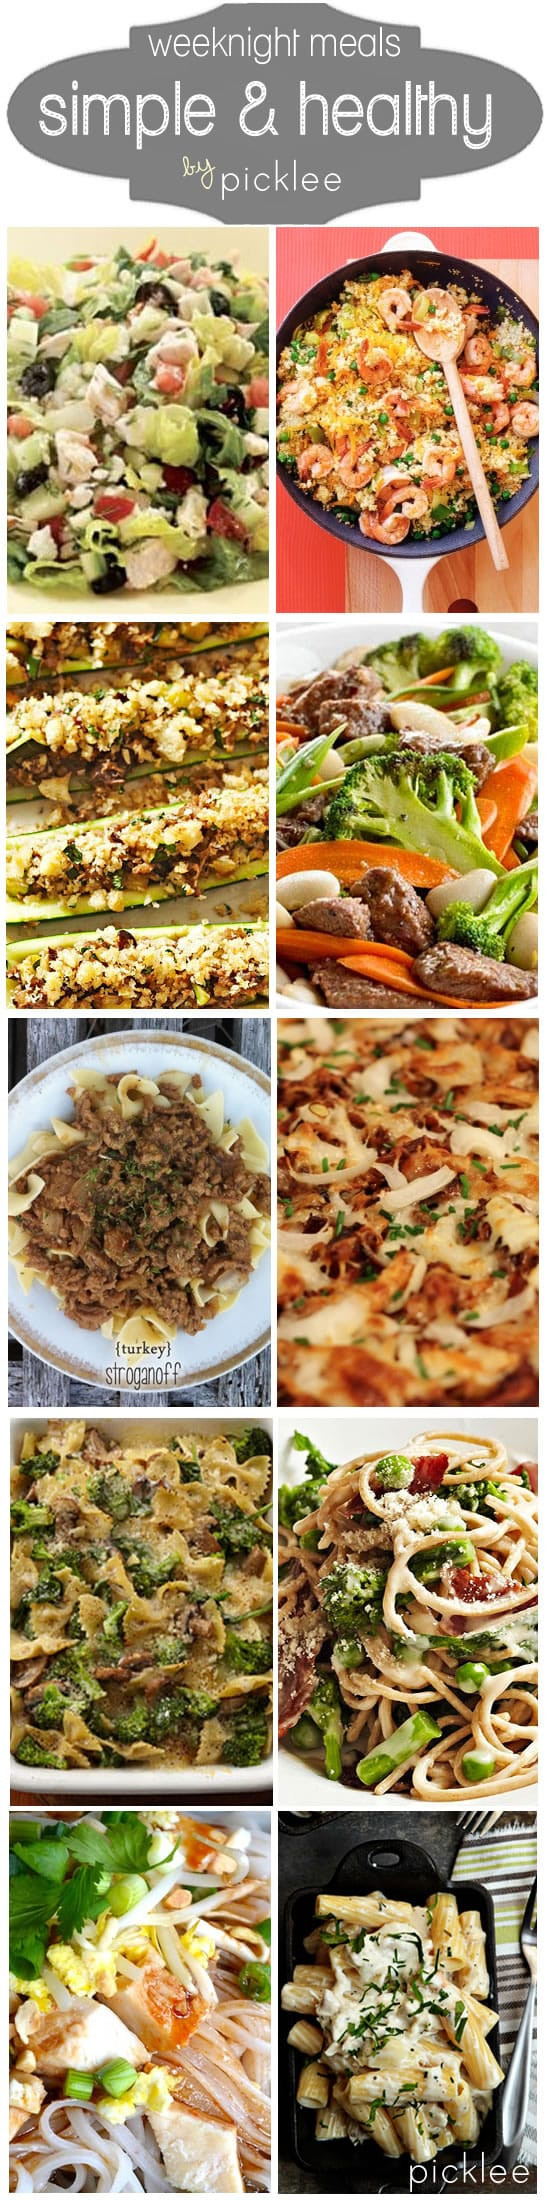 Simple Easy Healthy Dinners  10 Simple & Healthy Weeknight Dinners [recipes] Picklee